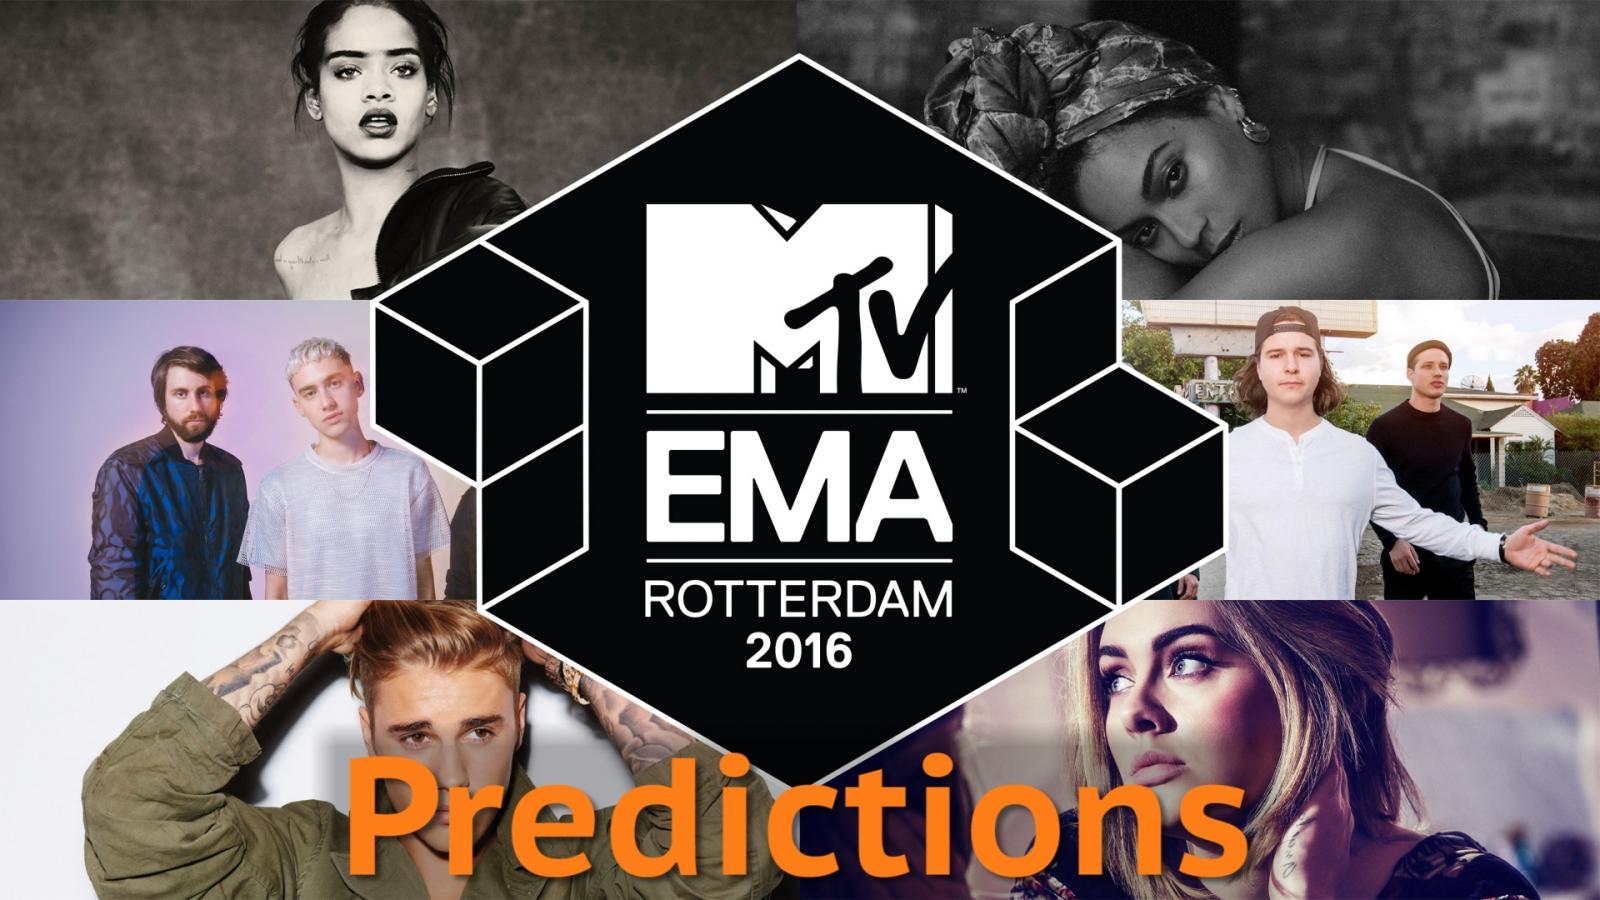 MTV EMAs 2016 predictions